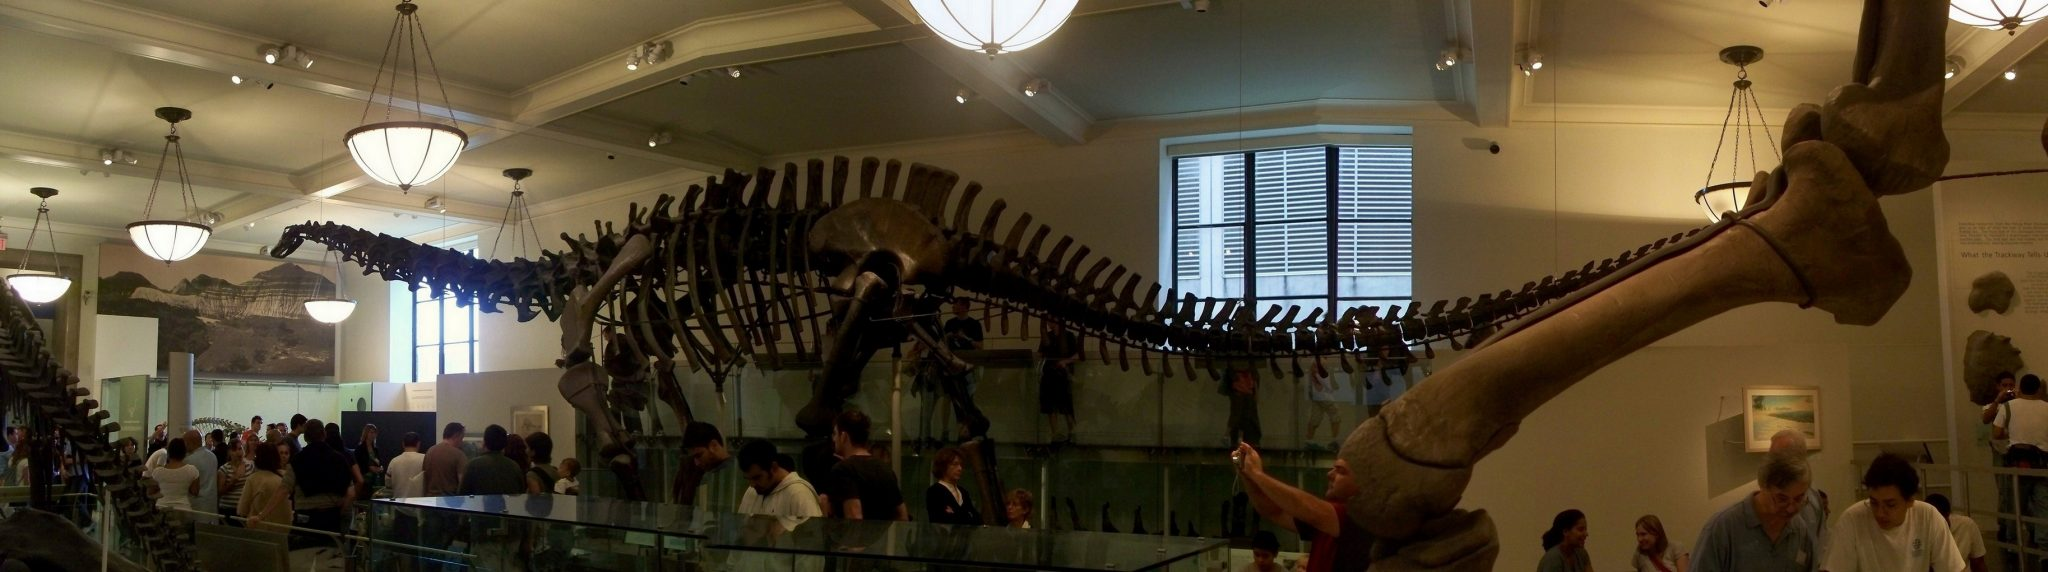 New York City, AMNH, Titanosaur, Skeleton